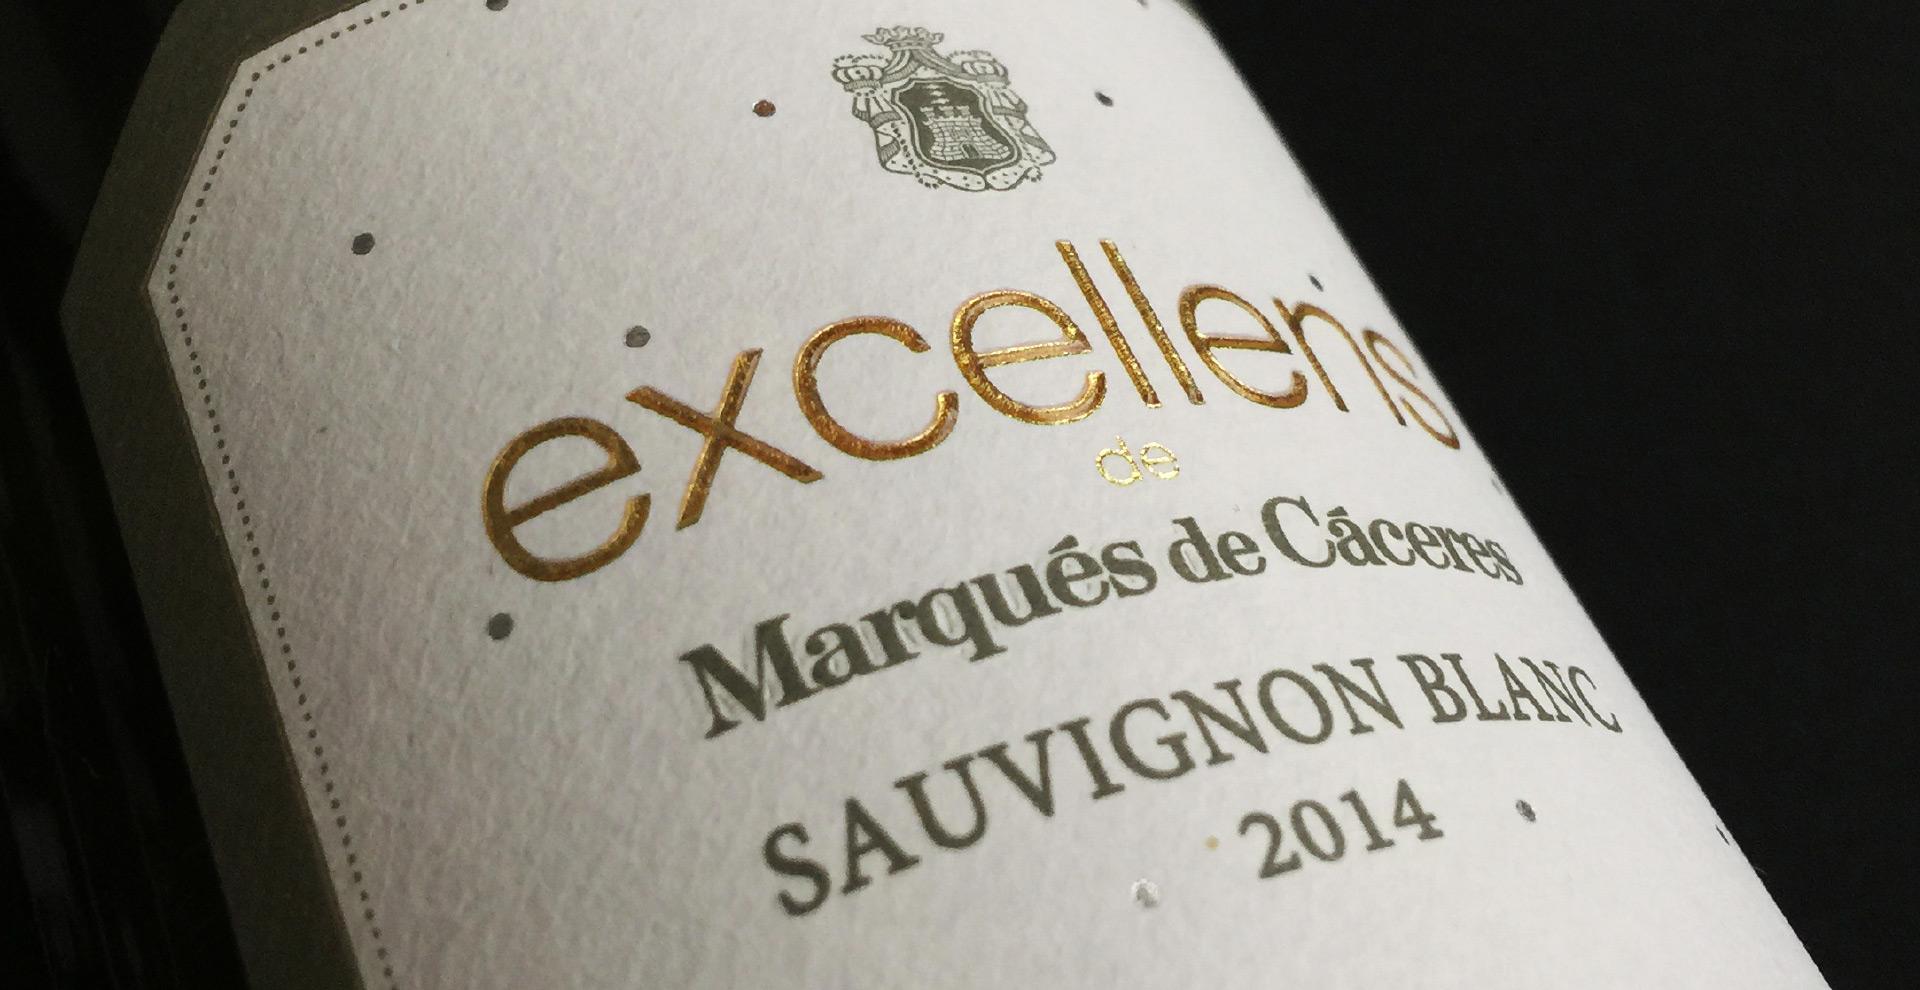 marques_de_caceres-excellens-cabecera